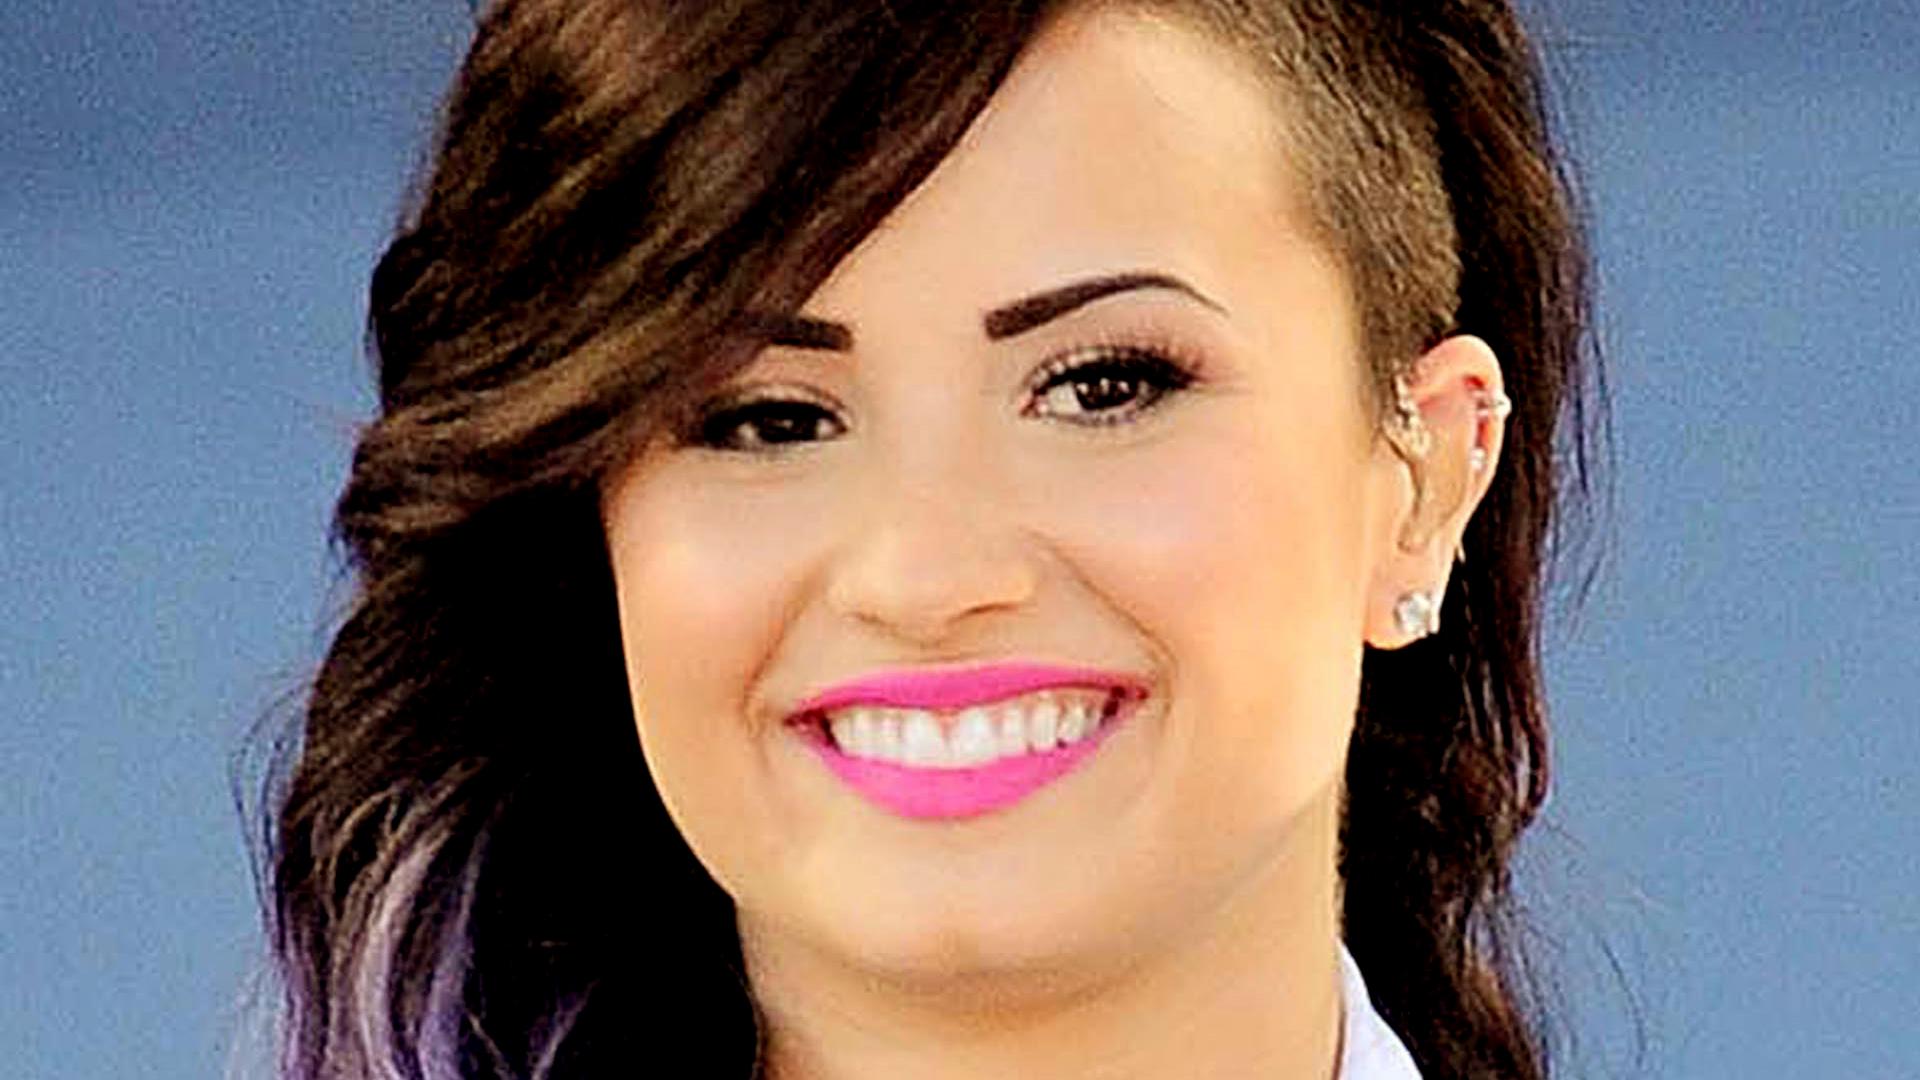 HD Demi Lovato Wallpapers 2 HdCoolWallpapersCom 1920x1080